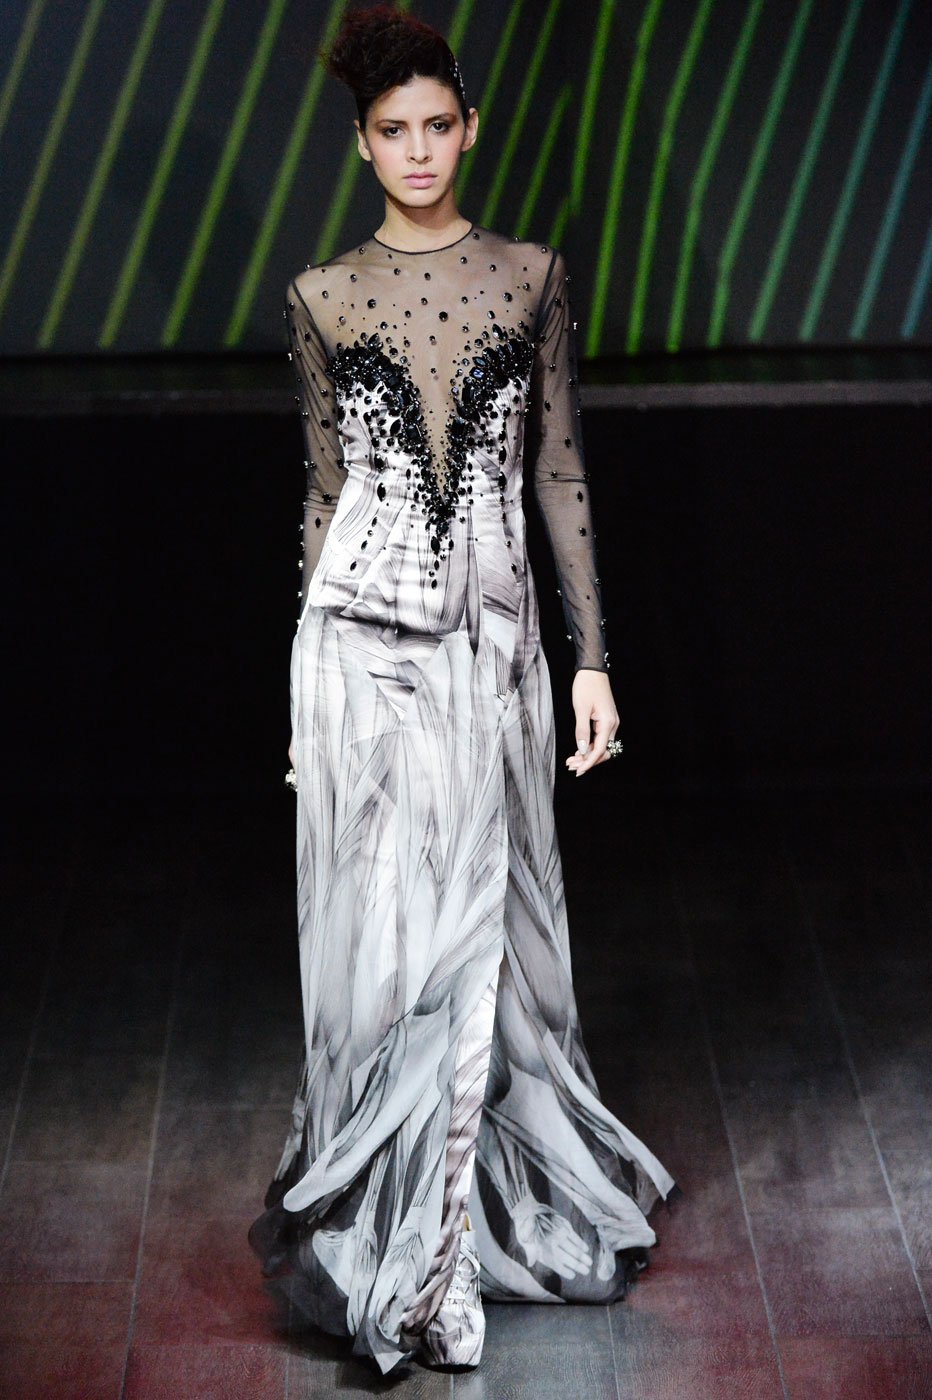 On-Aura-Tout-Vu-fashion-runway-show-haute-couture-paris-spring-summer-2015-the-impression-27